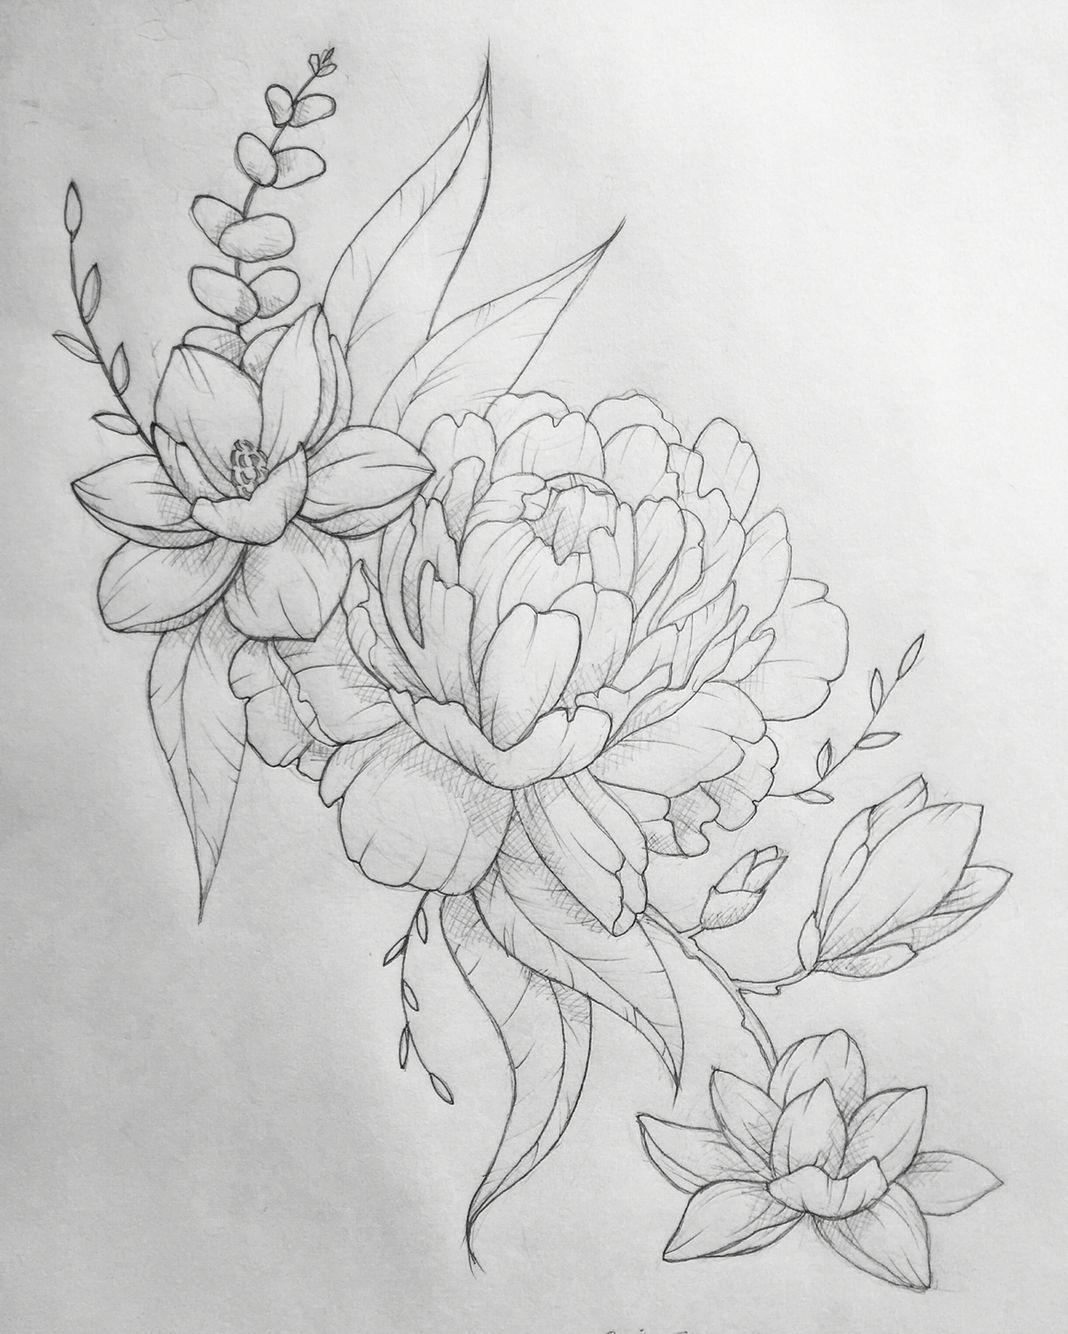 Line Drawing Flower Tattoo : Peony eucalyptus magnolia tattoo interested in custom